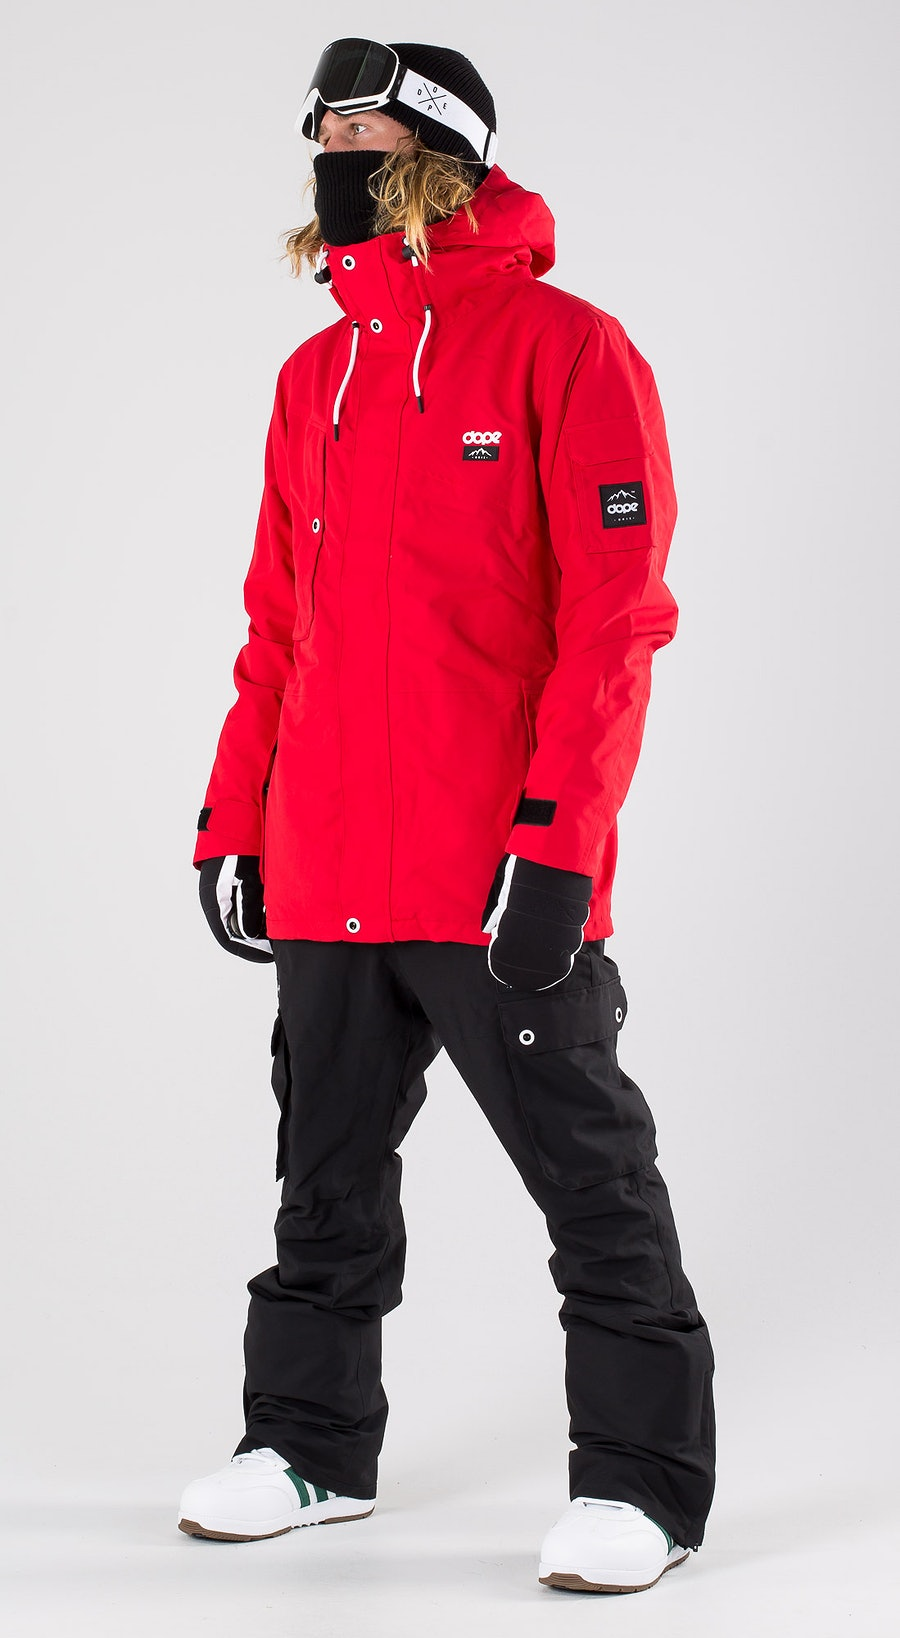 Dope Adept Red Snowboardkläder Multi